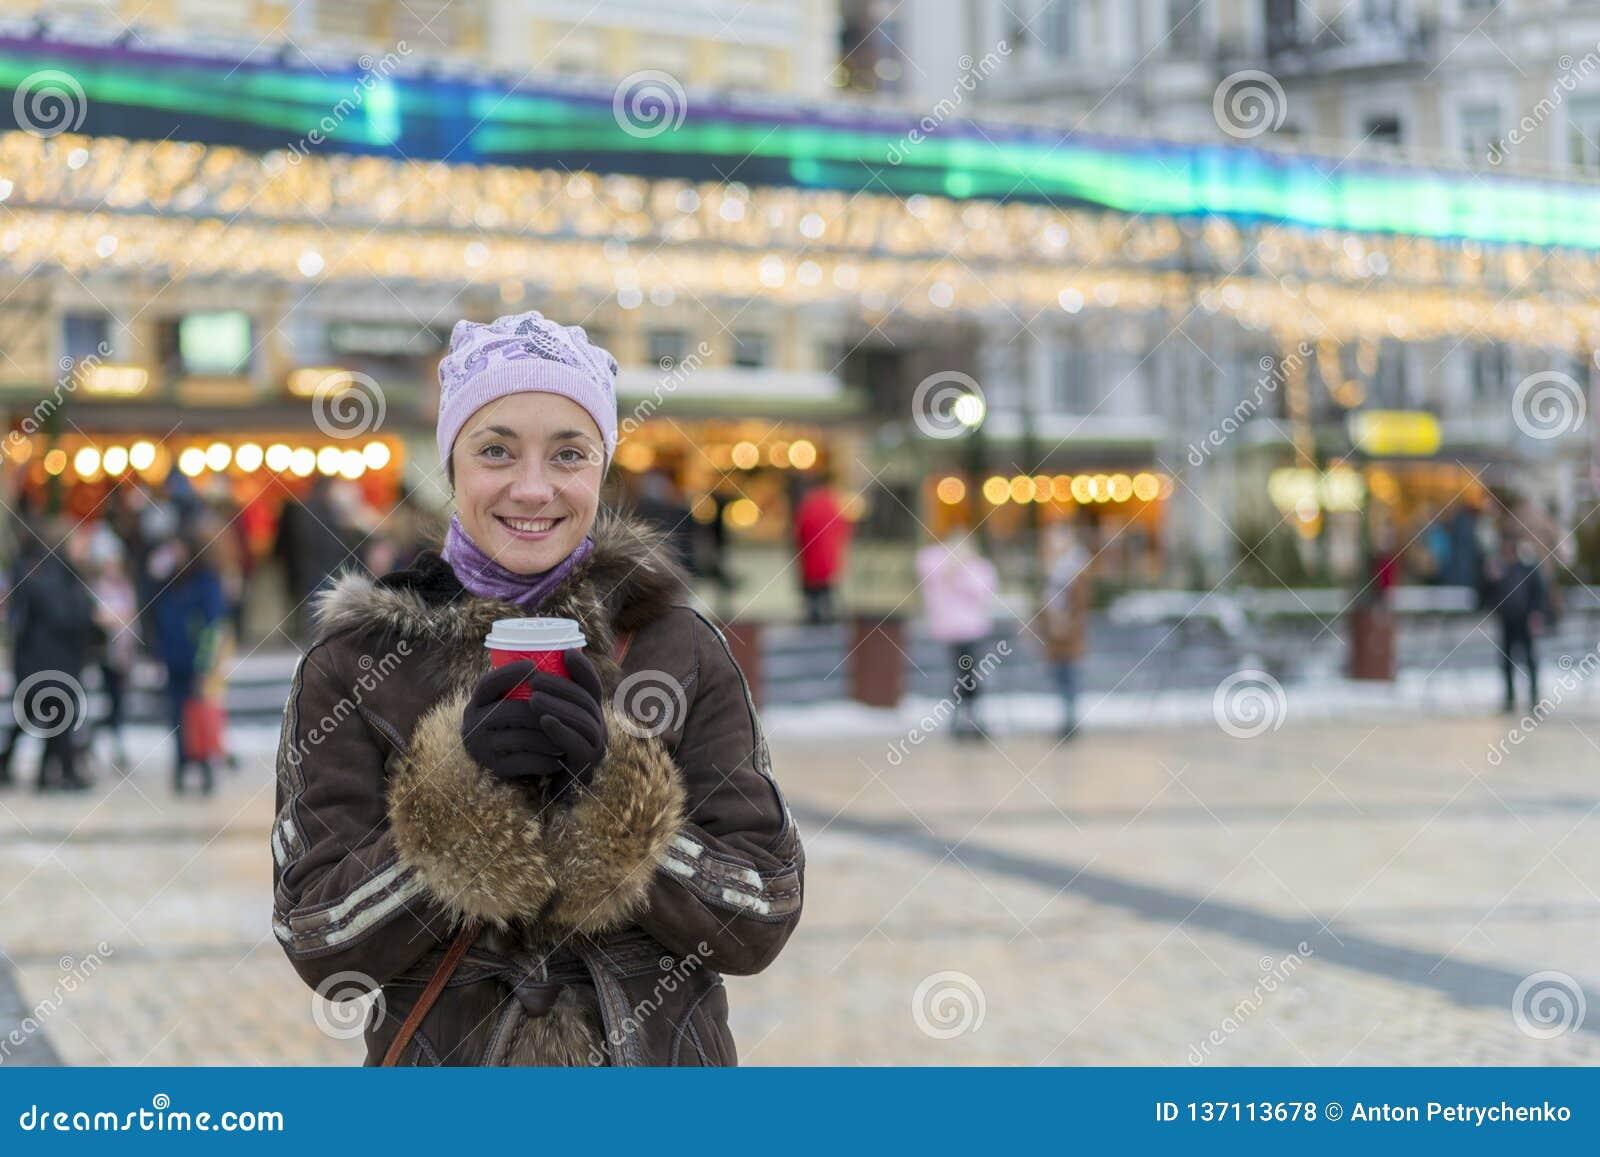 Schöne junge Frau mit Kaffeetasse in der Stadt Schönheit mit Kaffee auf der Straße in der Winterkleidung Frau, die heißes hat